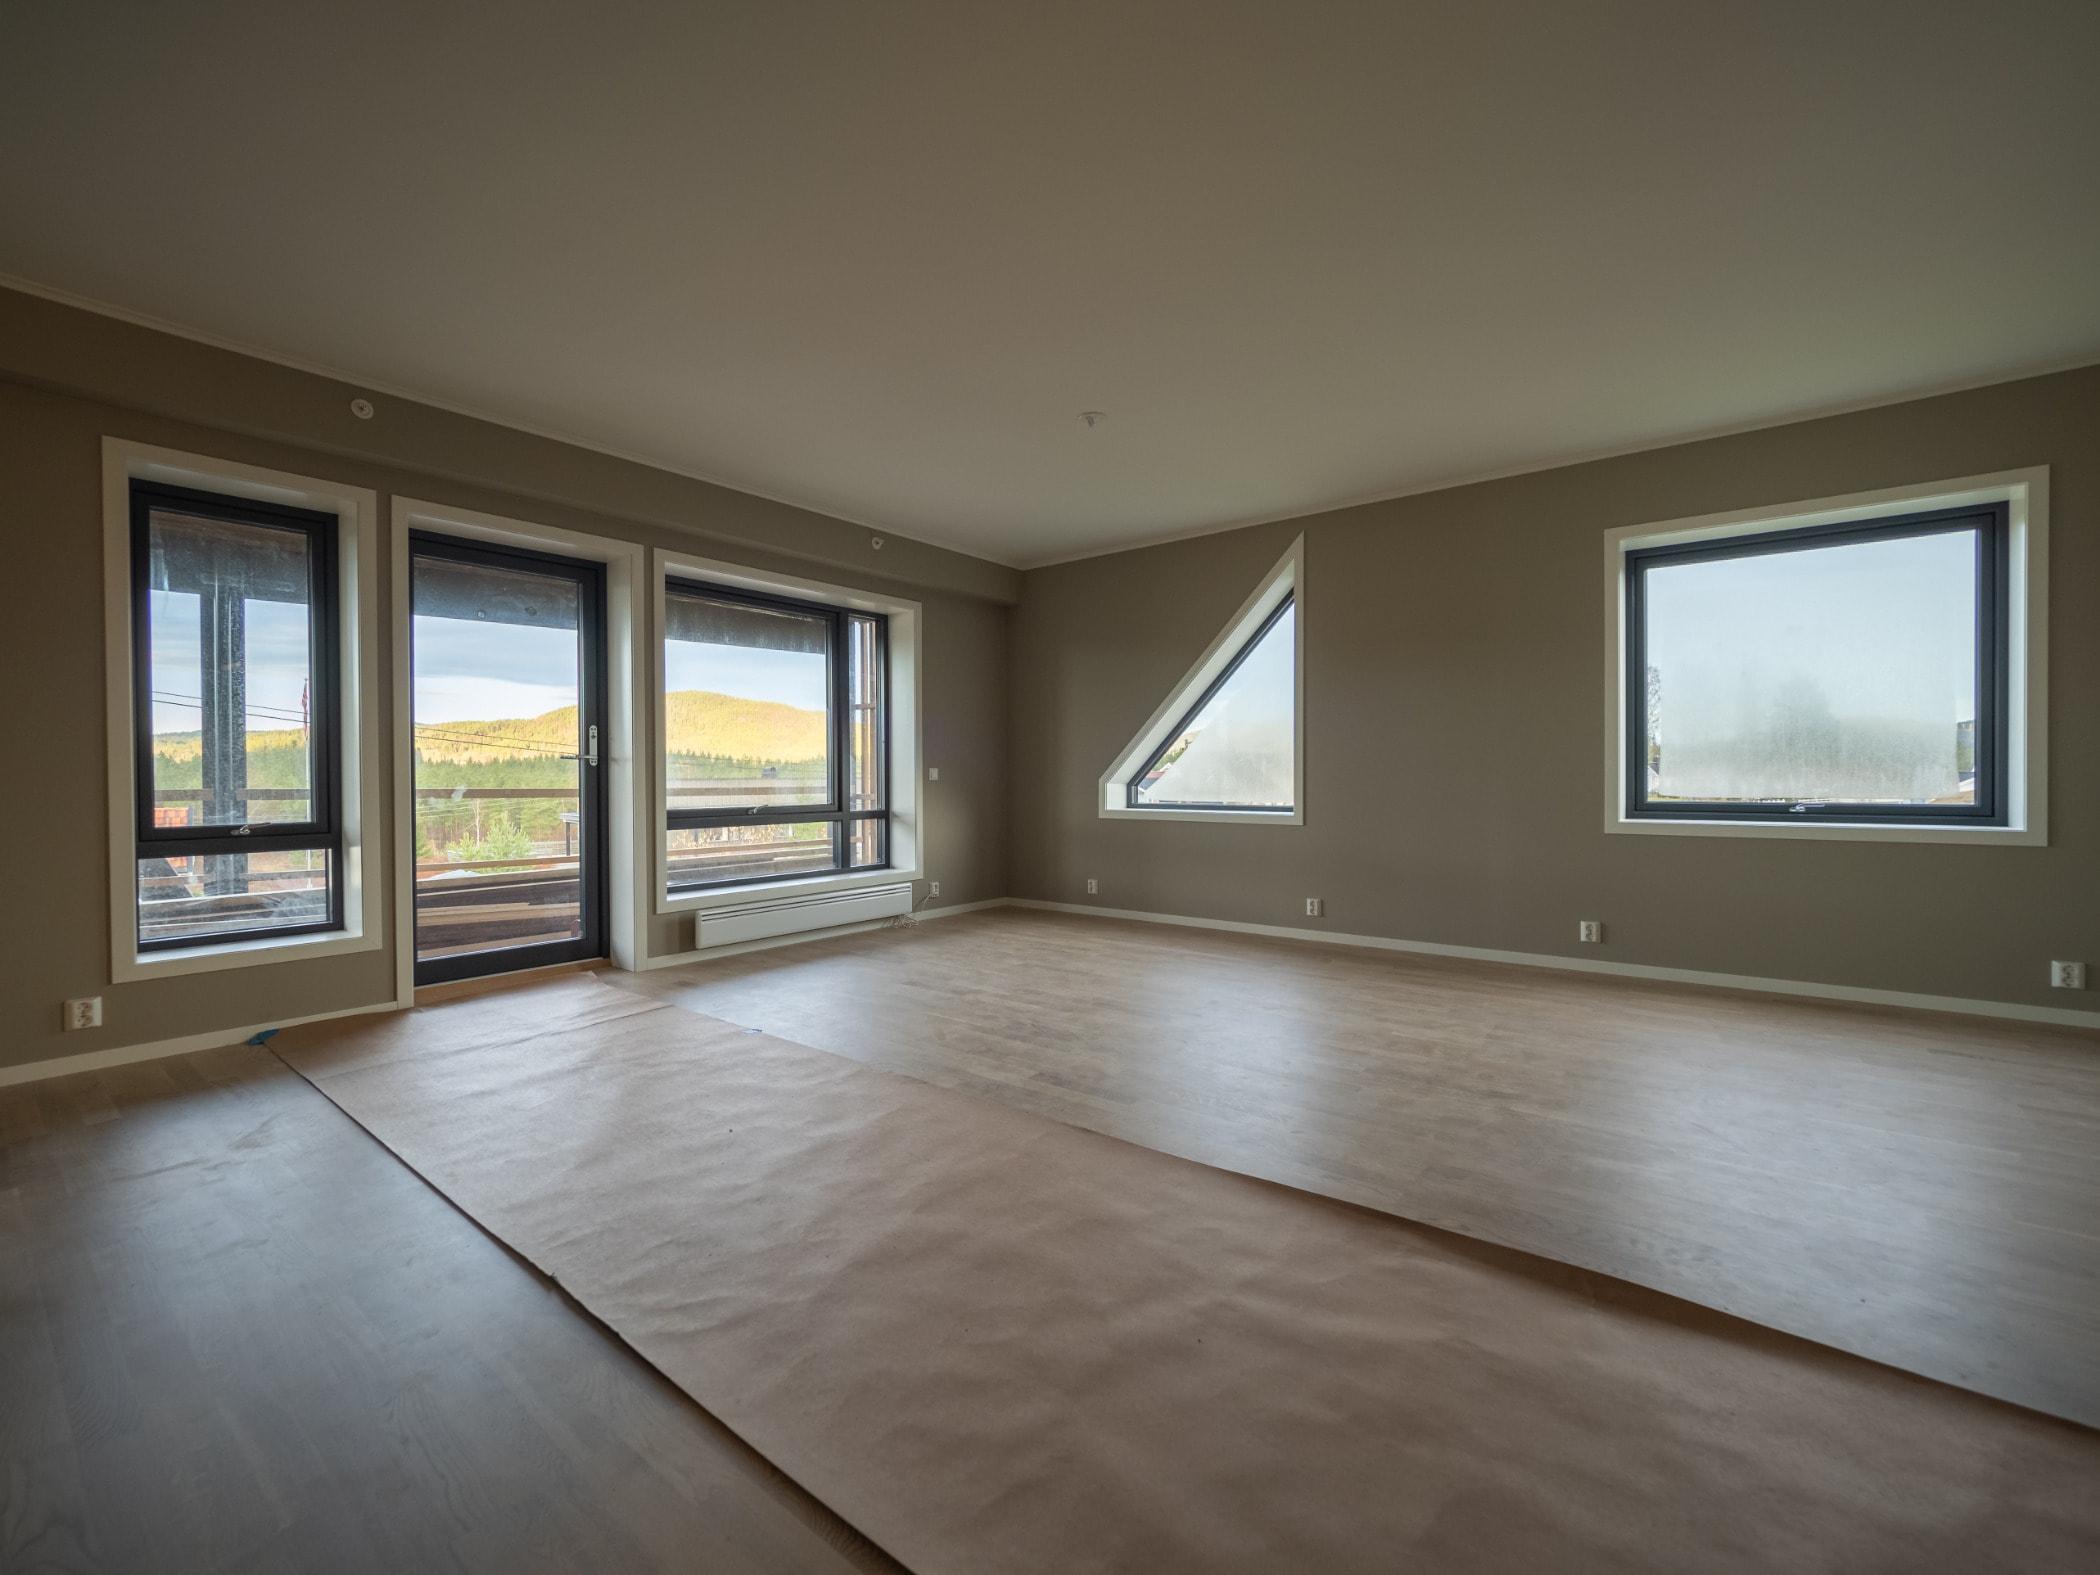 Laminate flooring, Building, Hardwood, Ceiling, Daylighting, Property, Room, Floor